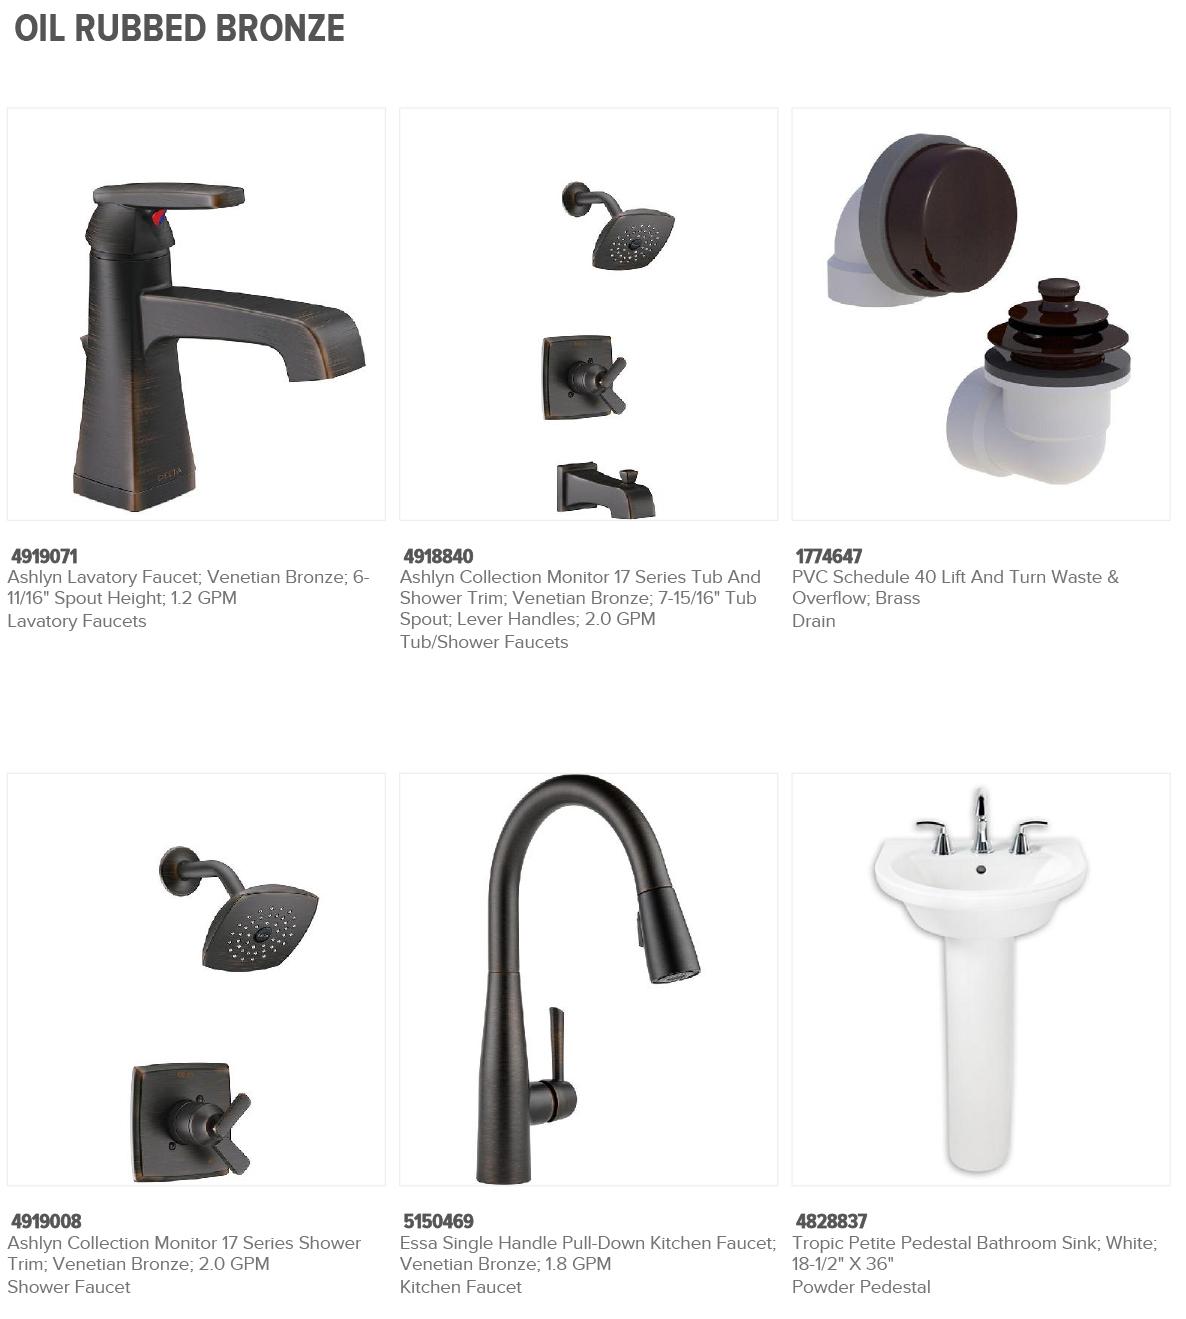 Cutshaw plumbing prov-Bronse.jpg